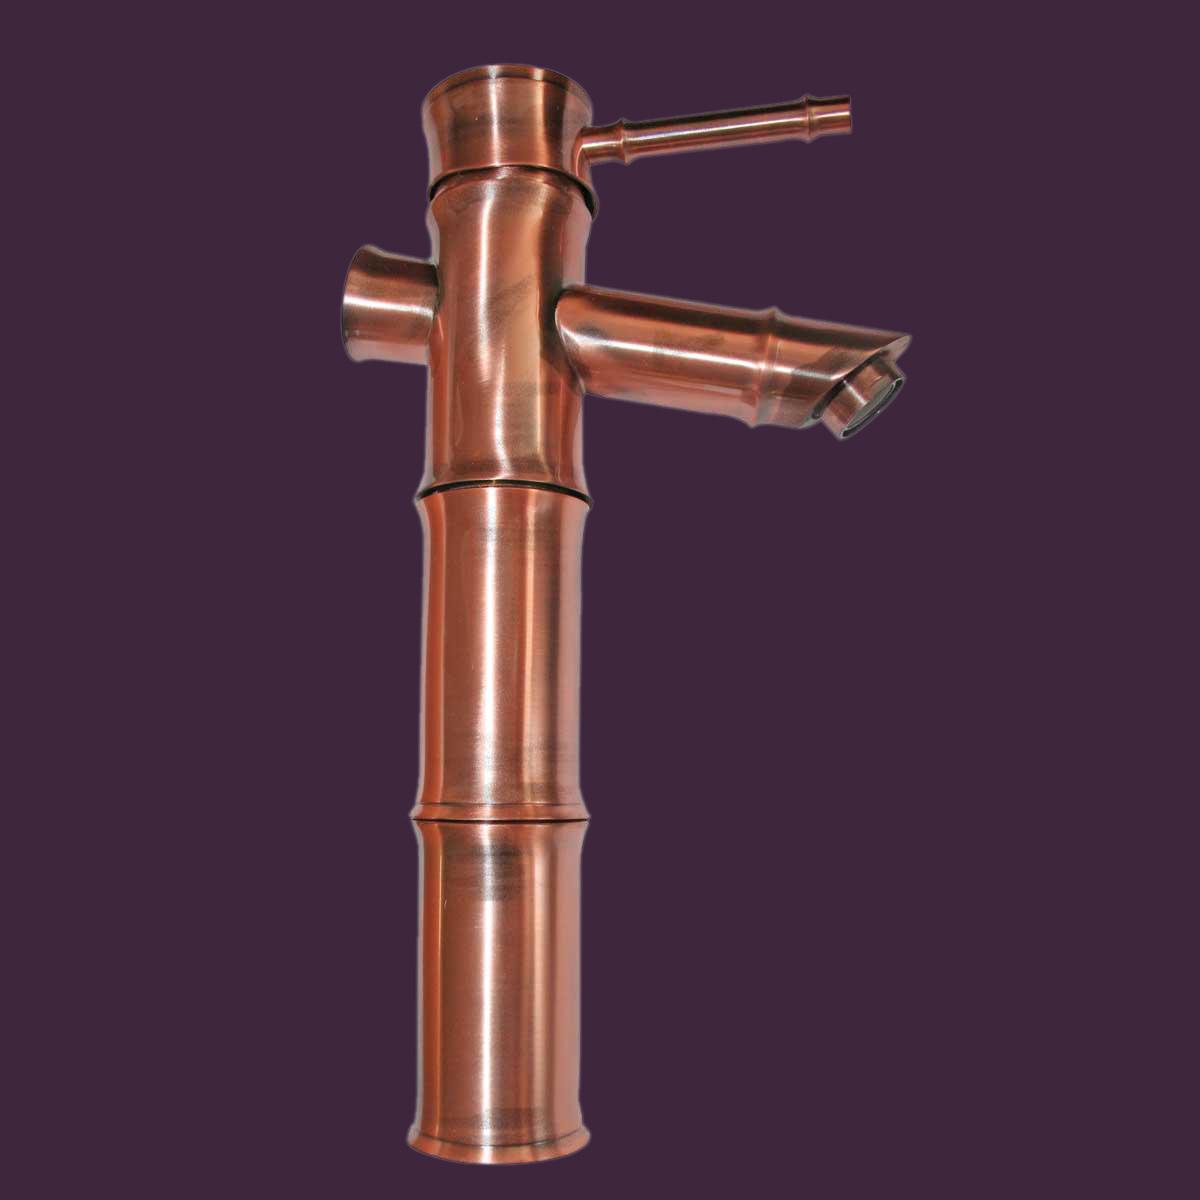 Bathroom Faucet Antique Copper Bamboo Single Hole 1 Handle